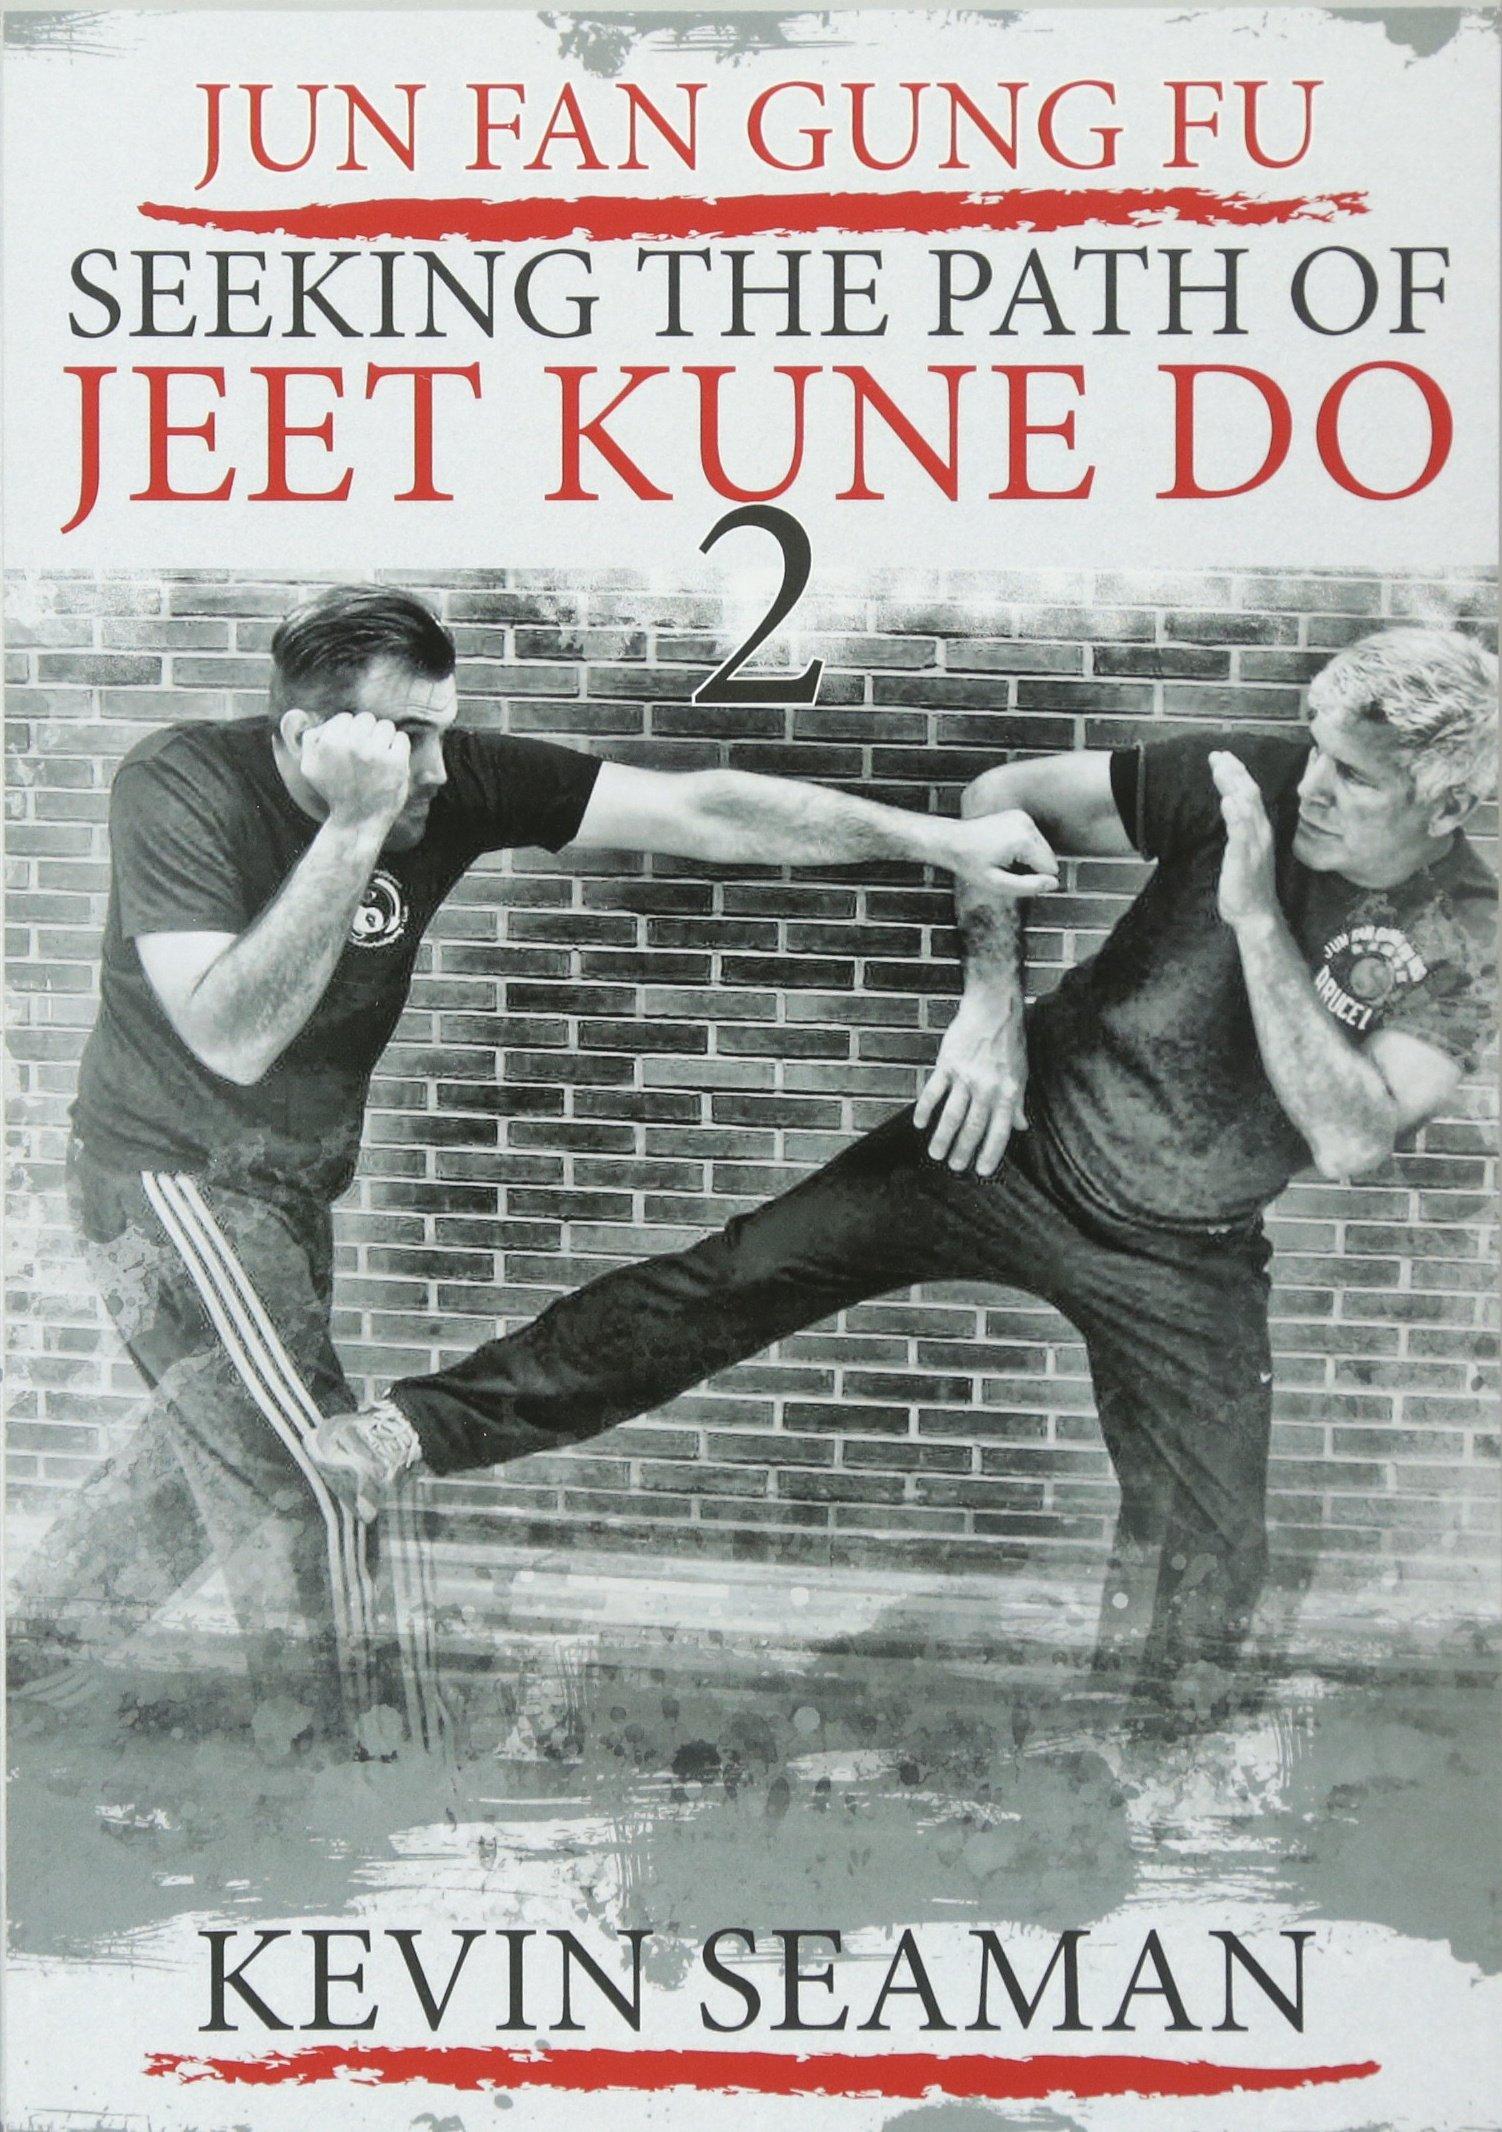 jun-fan-gung-fu-seeking-the-path-of-jeet-kune-do-2-volume-2